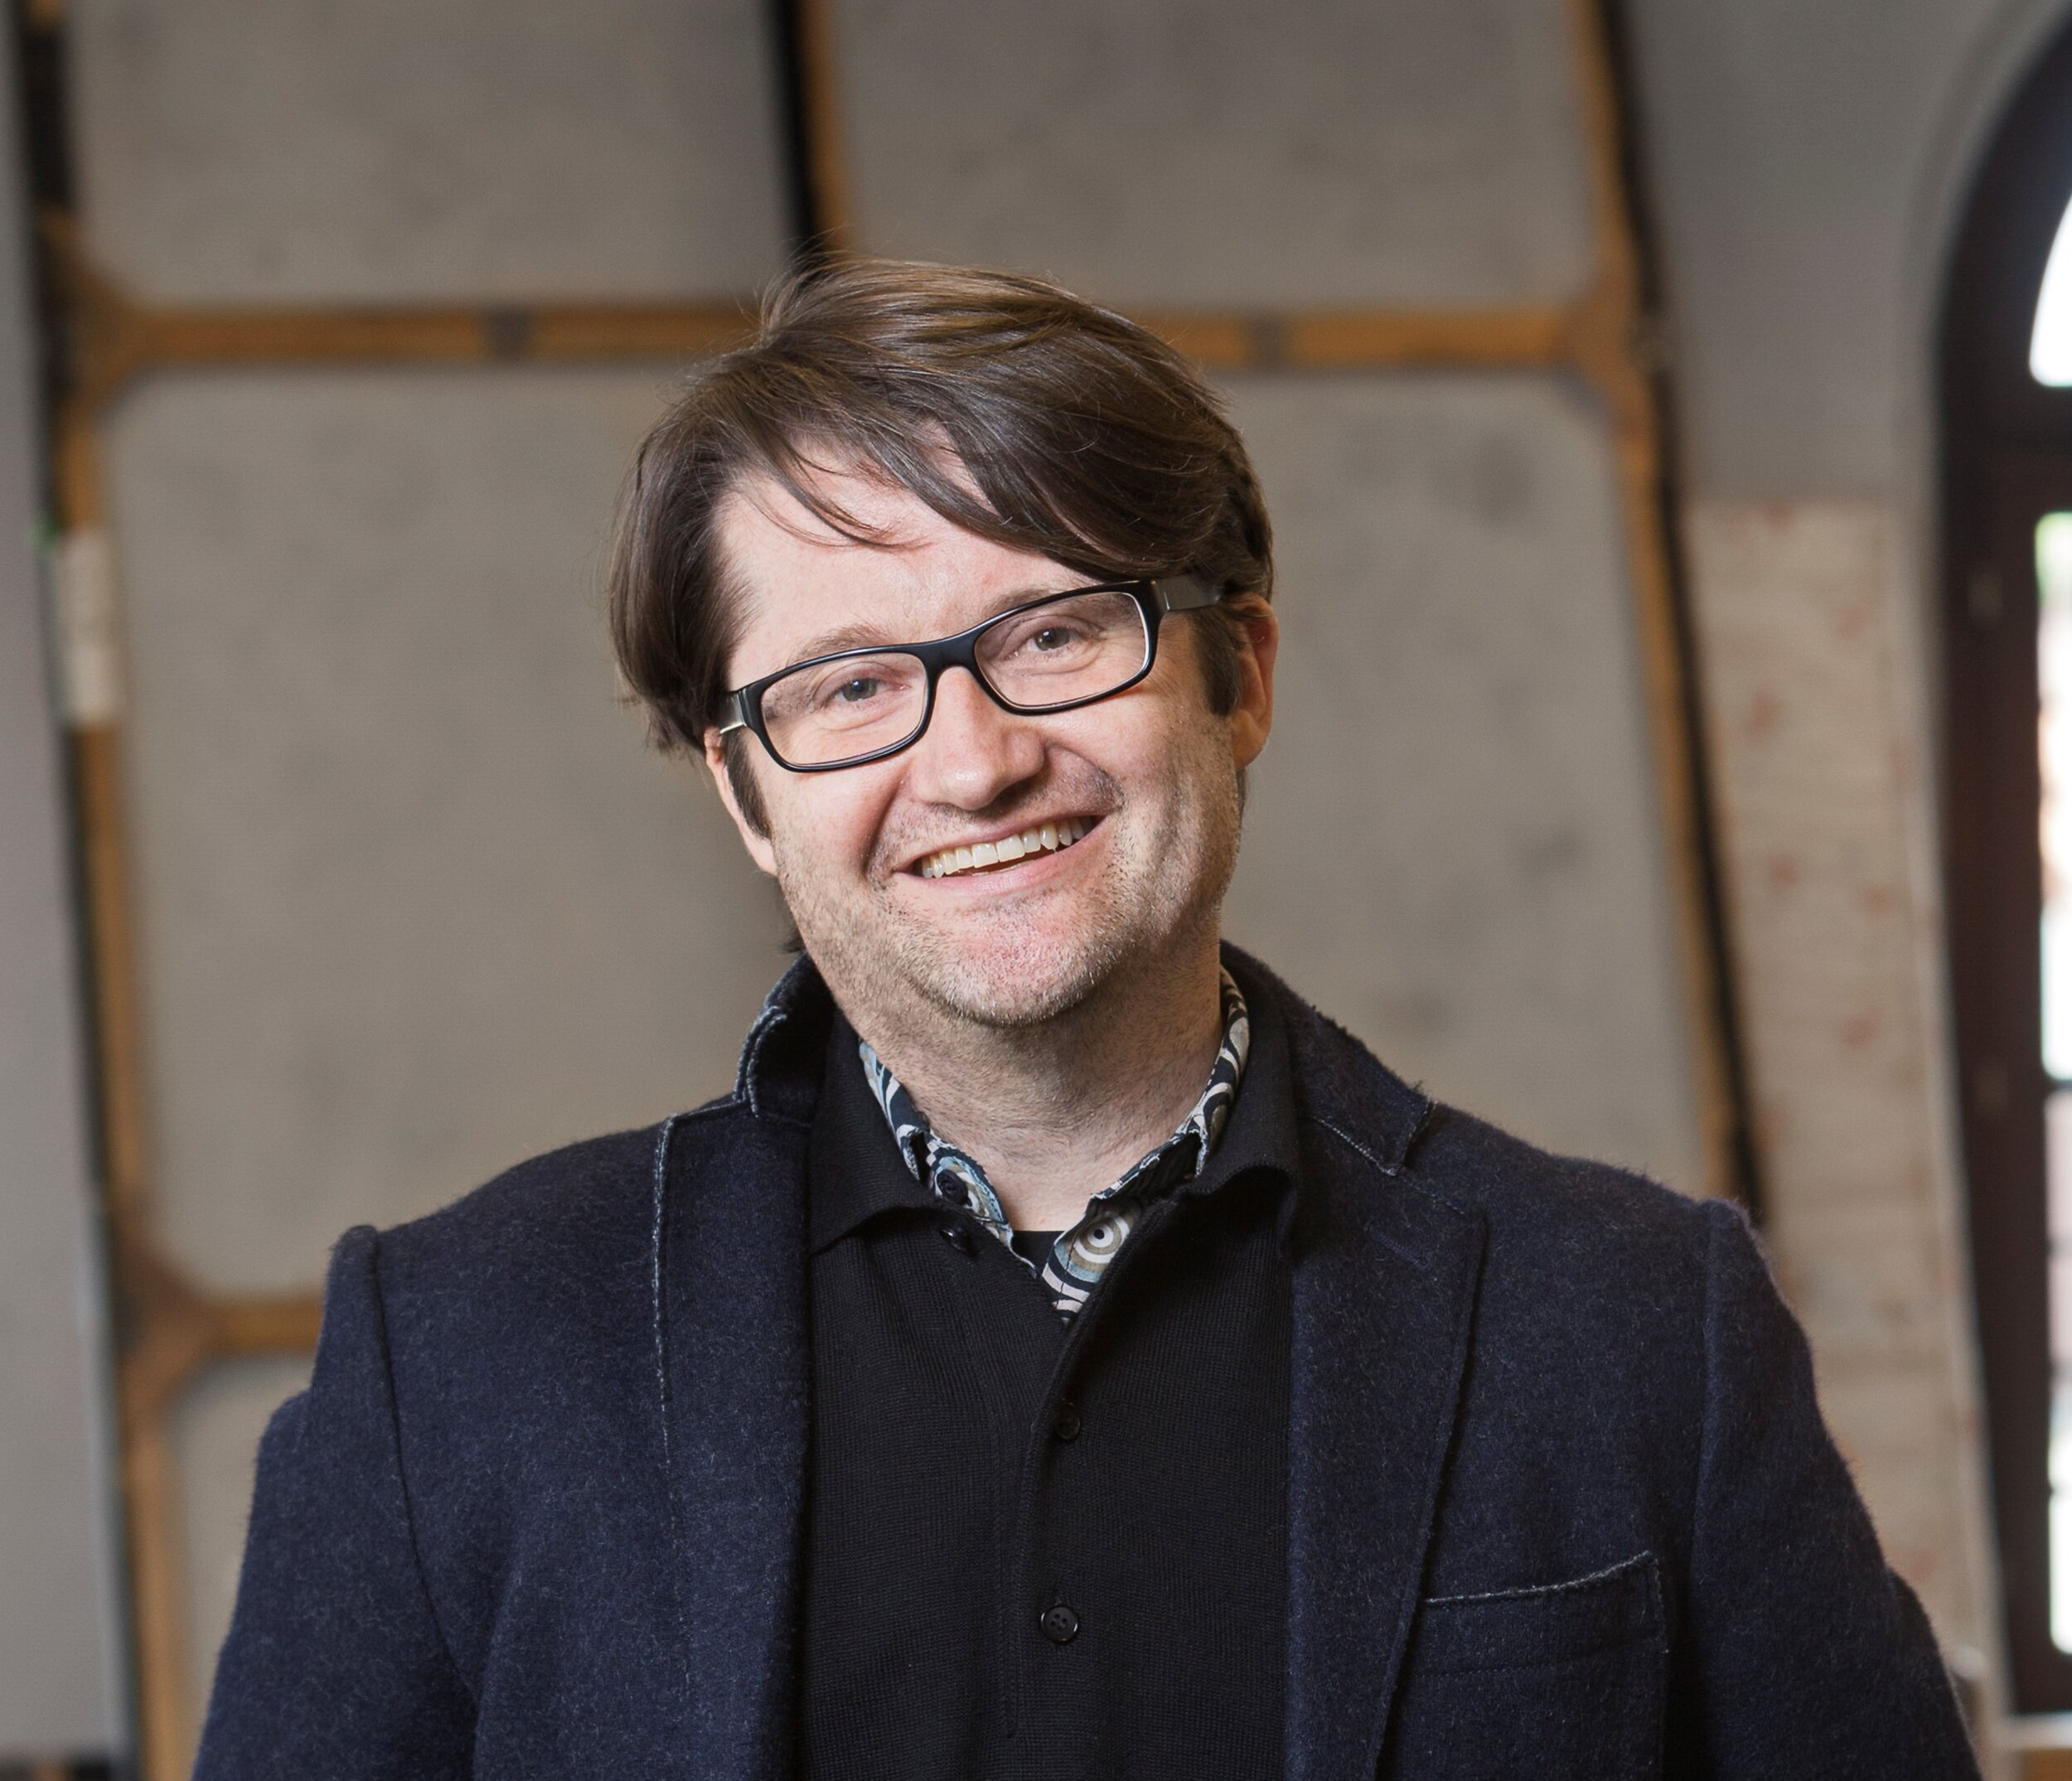 Gregor Zöllig, Artistic Director & chief choreographer Tanztheater Staatstheater Braunschweig